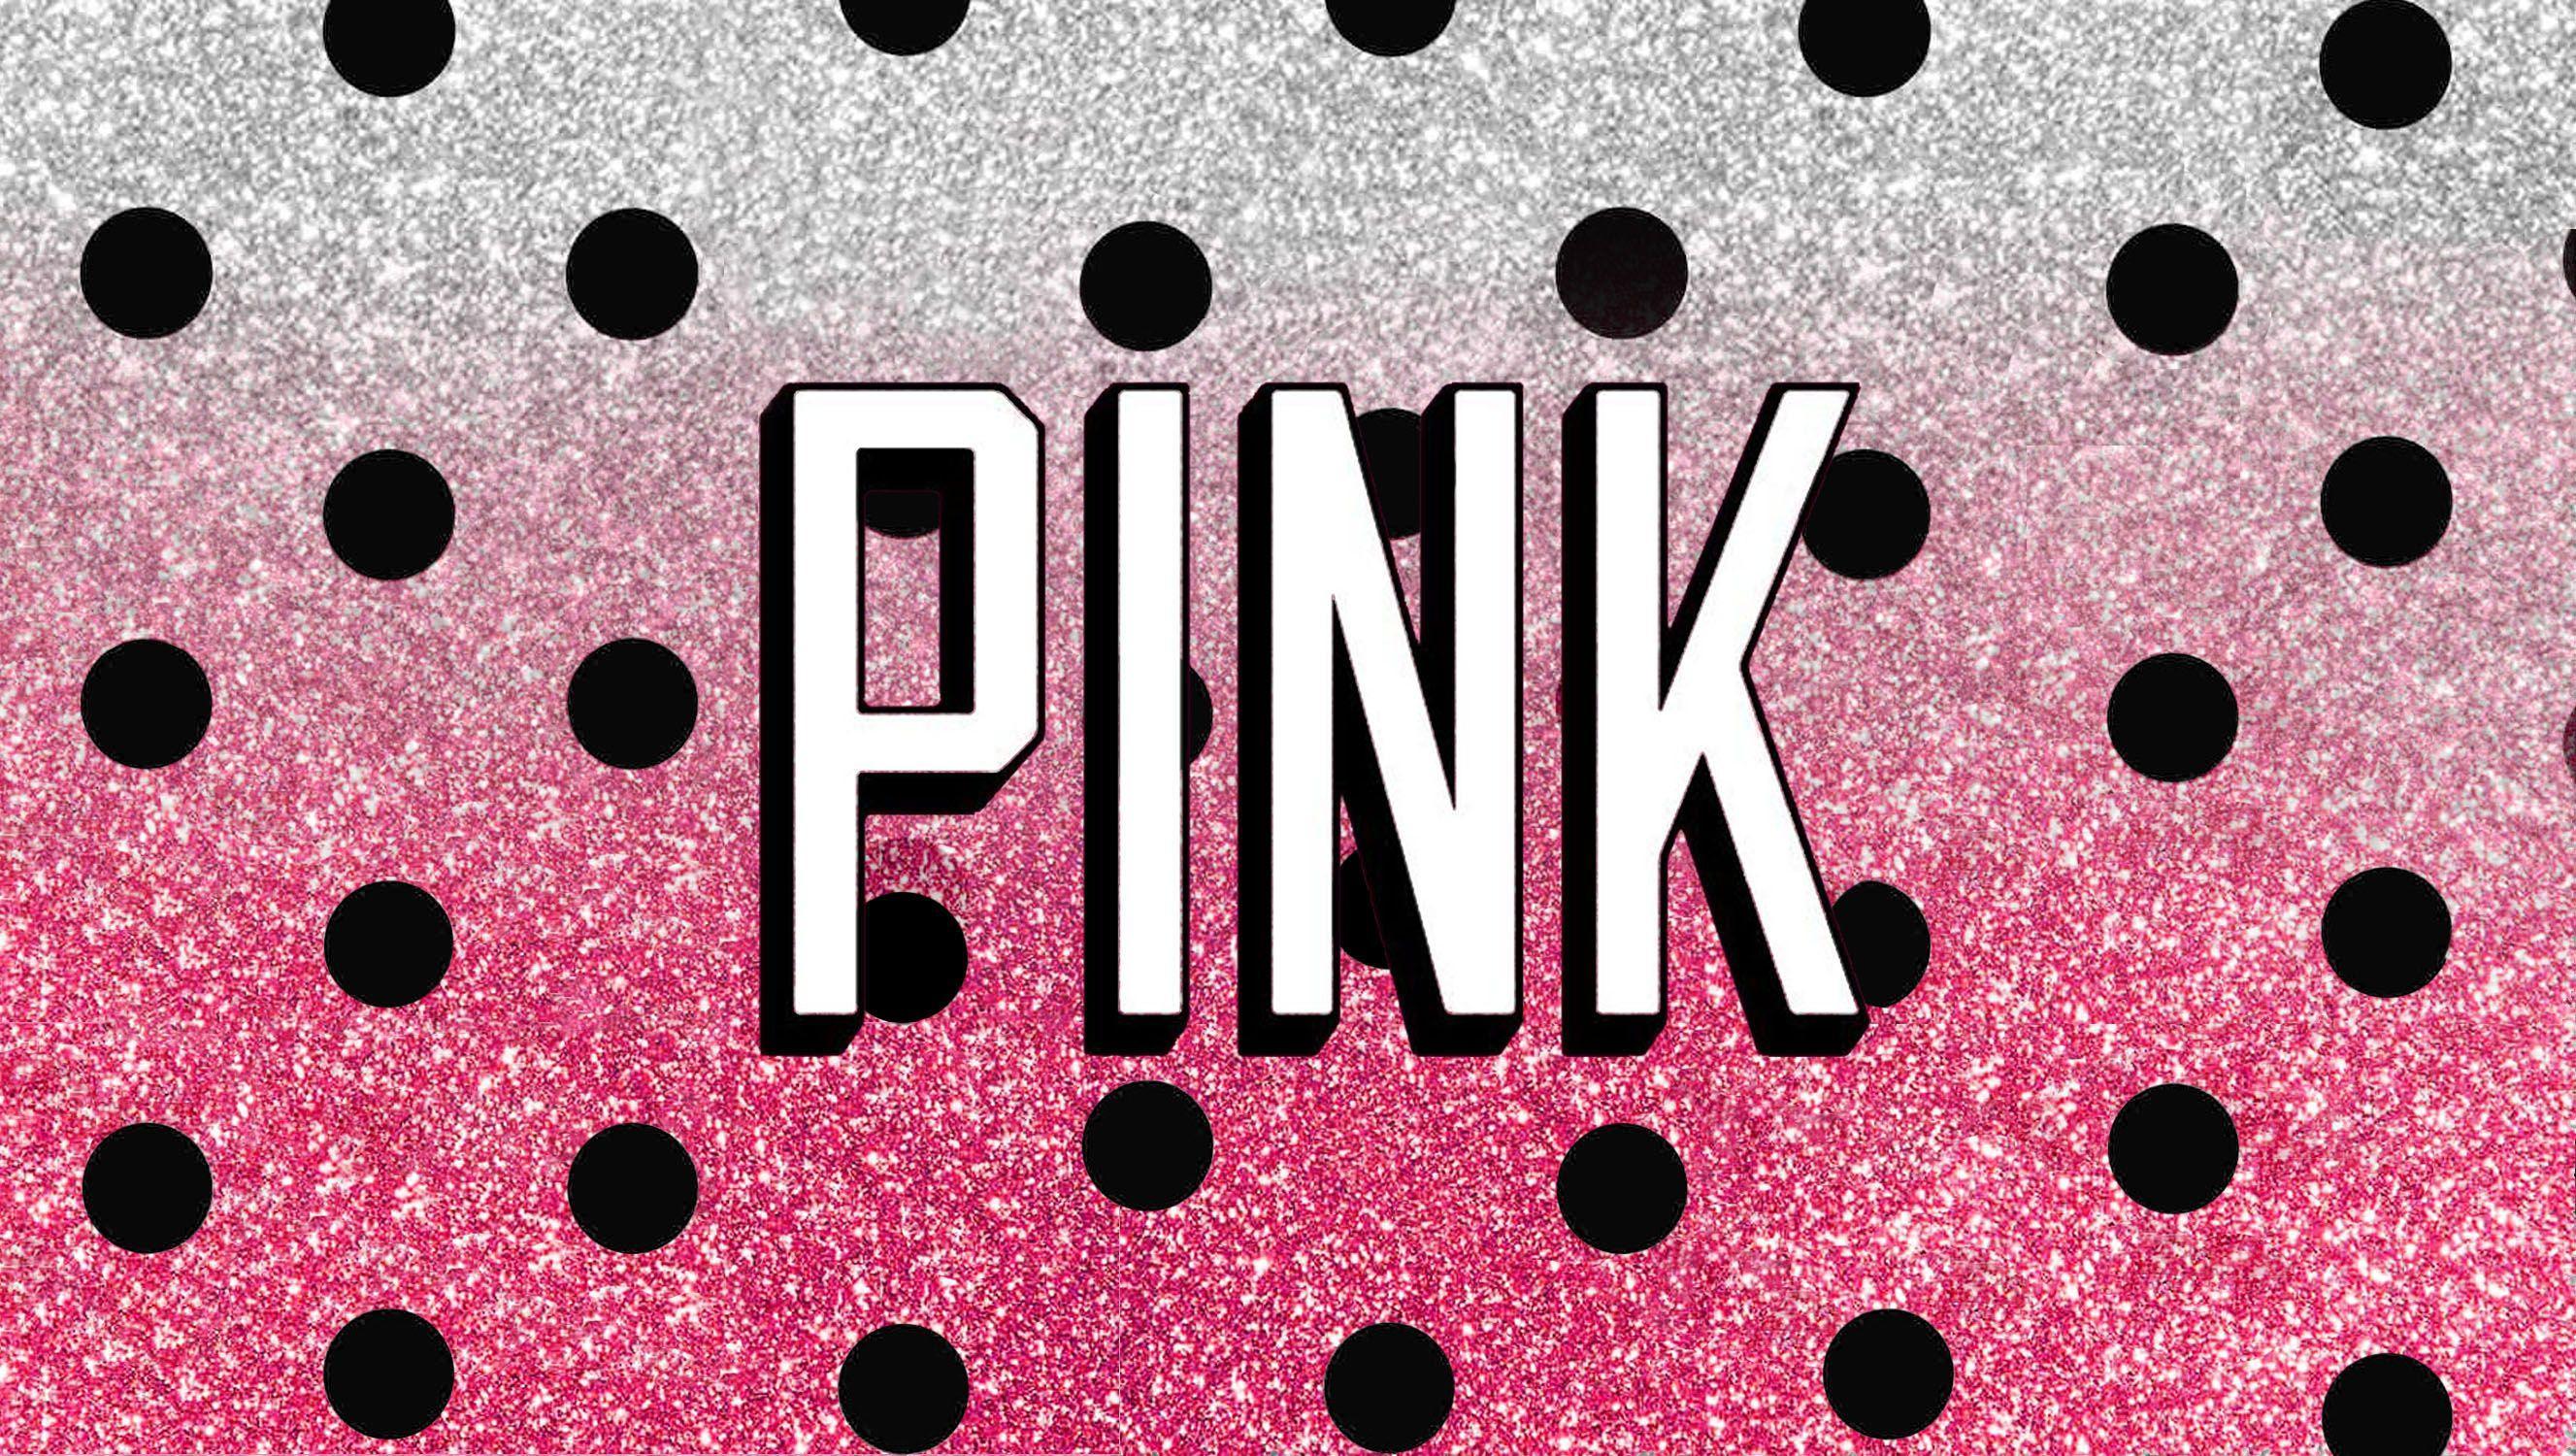 Victoria S Secret Pink Wallpaper Wallpapersafari